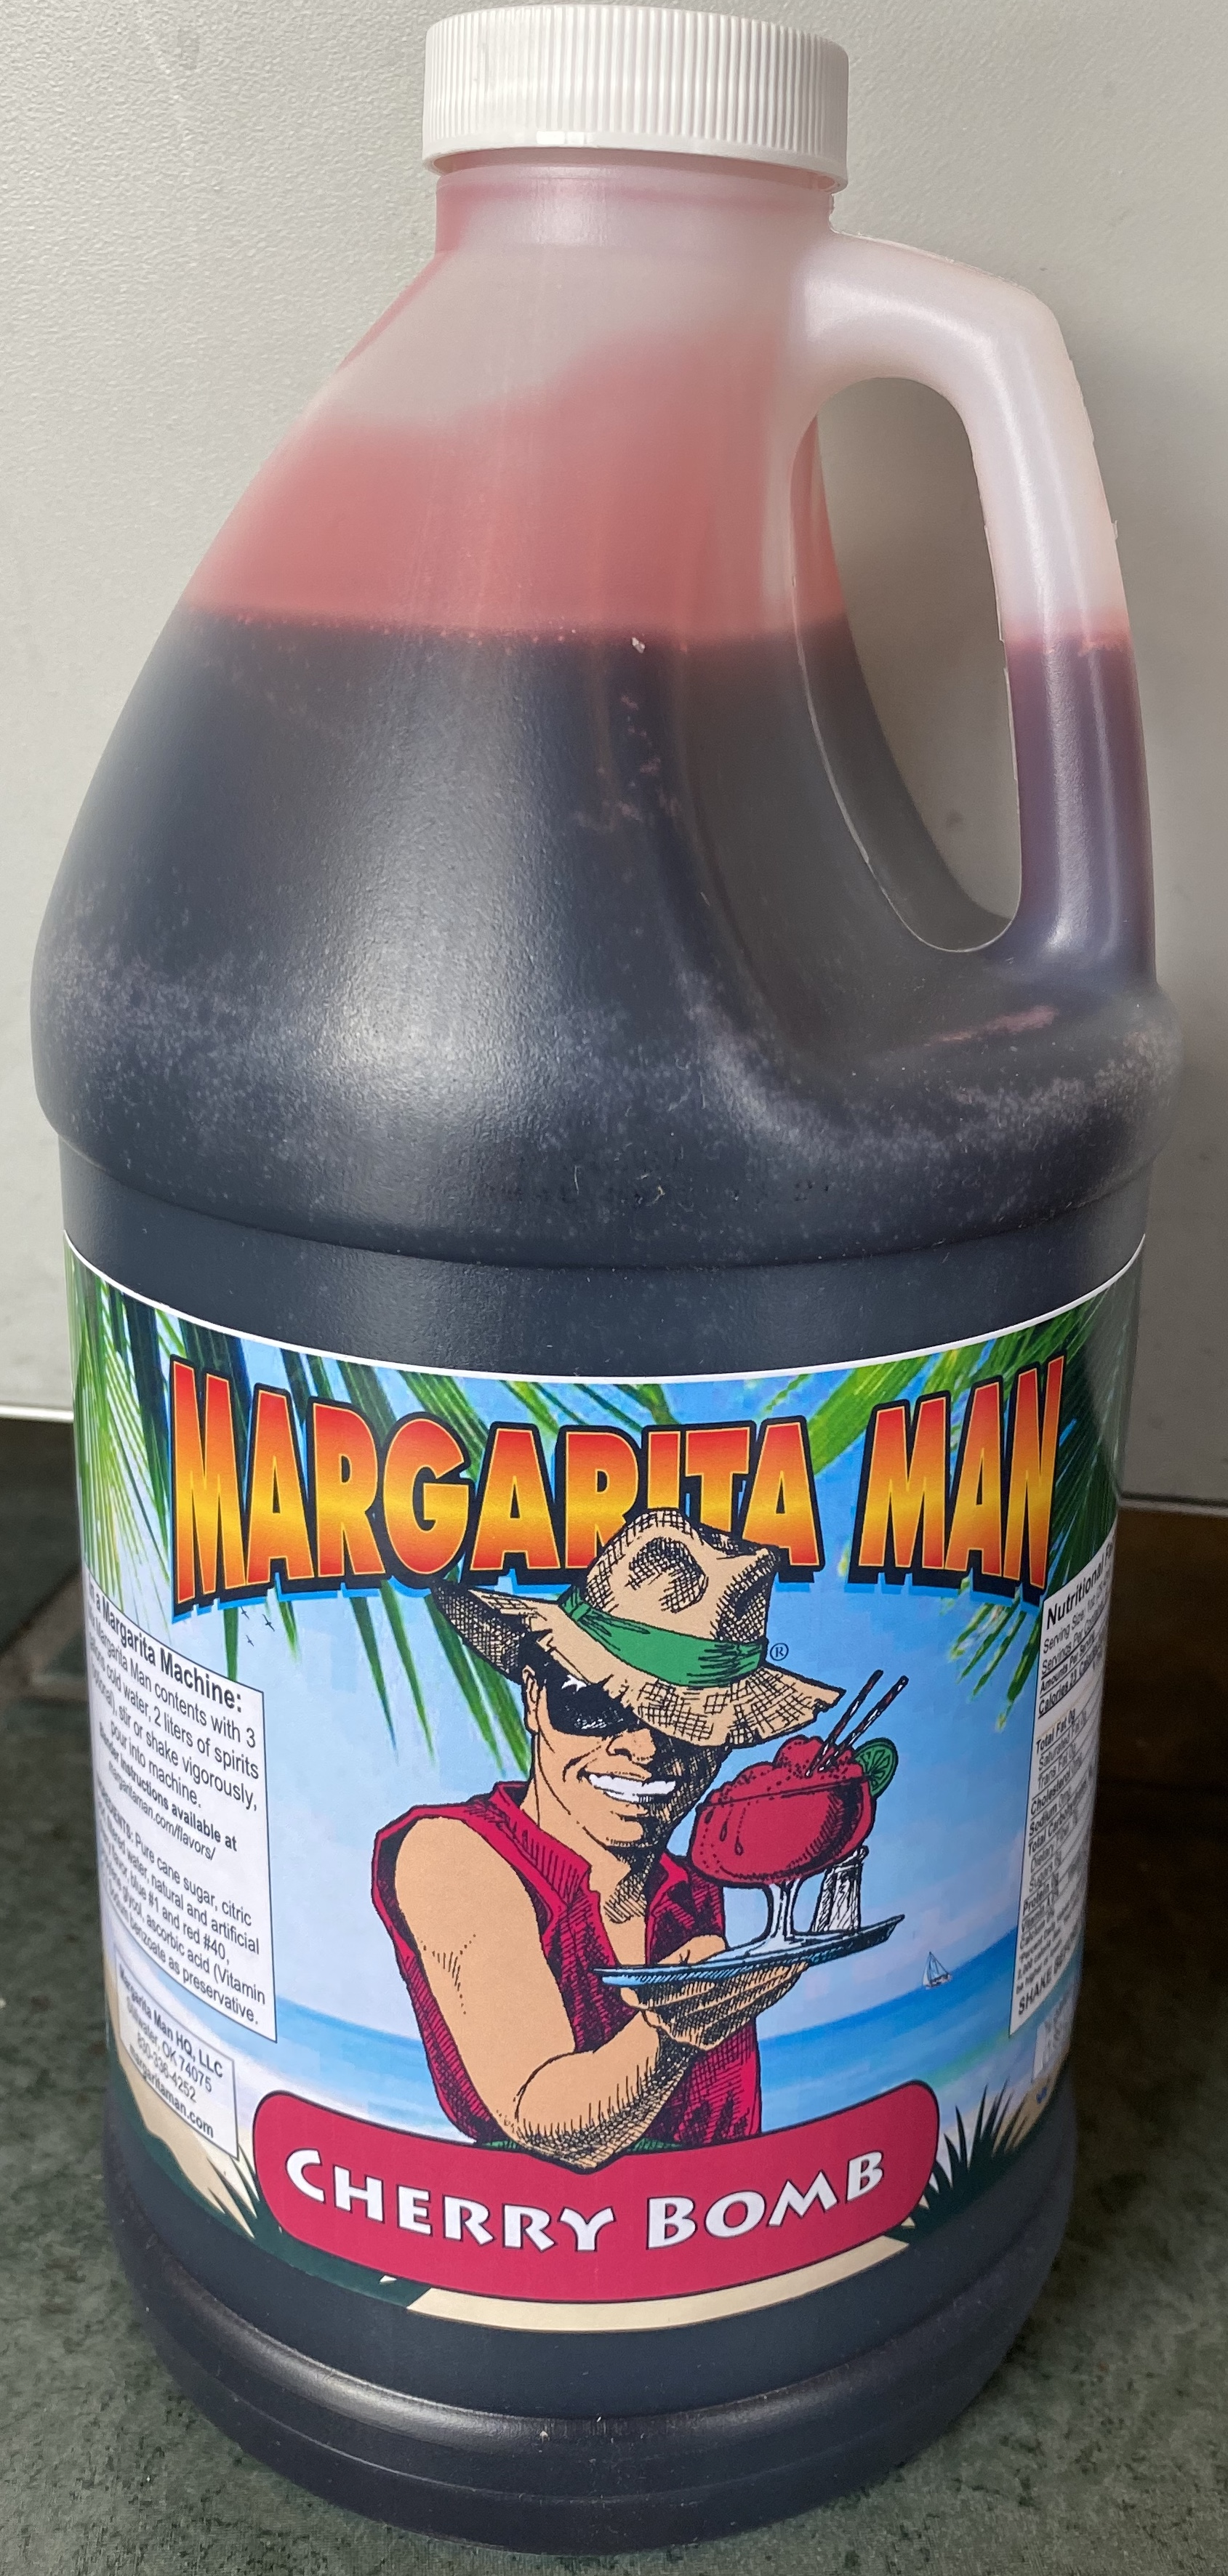 Margarita Man Mrg12 Cherry Bomb Concentrate